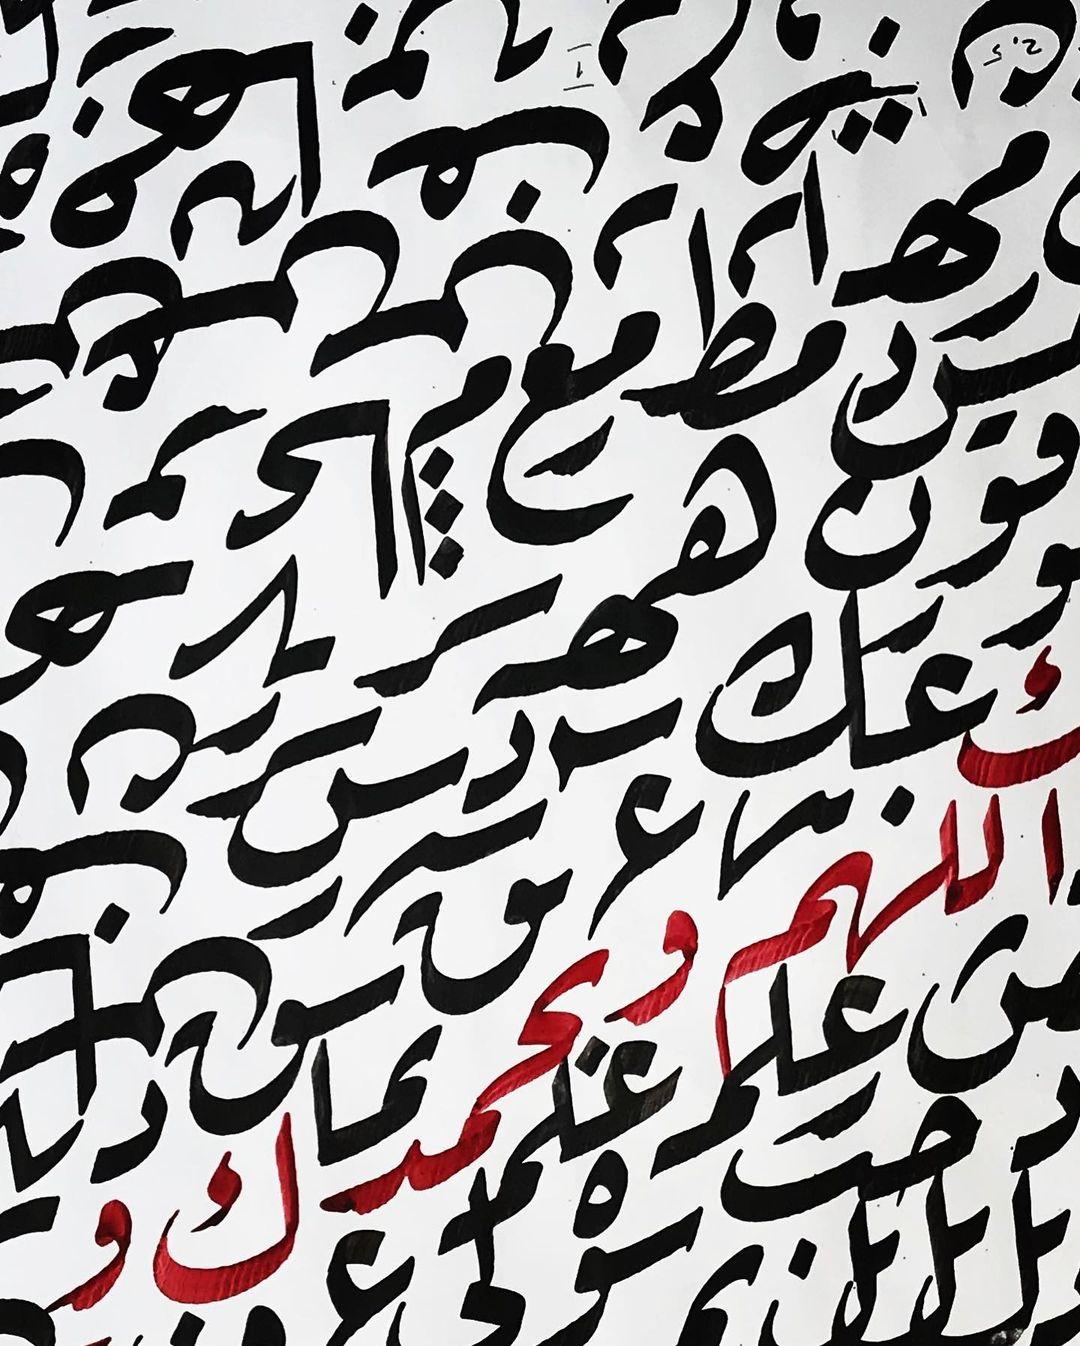 Donwload Photo Mashq #mashq #مشق #exercise #arabiccalligraphy #islamiccalligraphy #tezhip #hüs...- hattat_aa 5